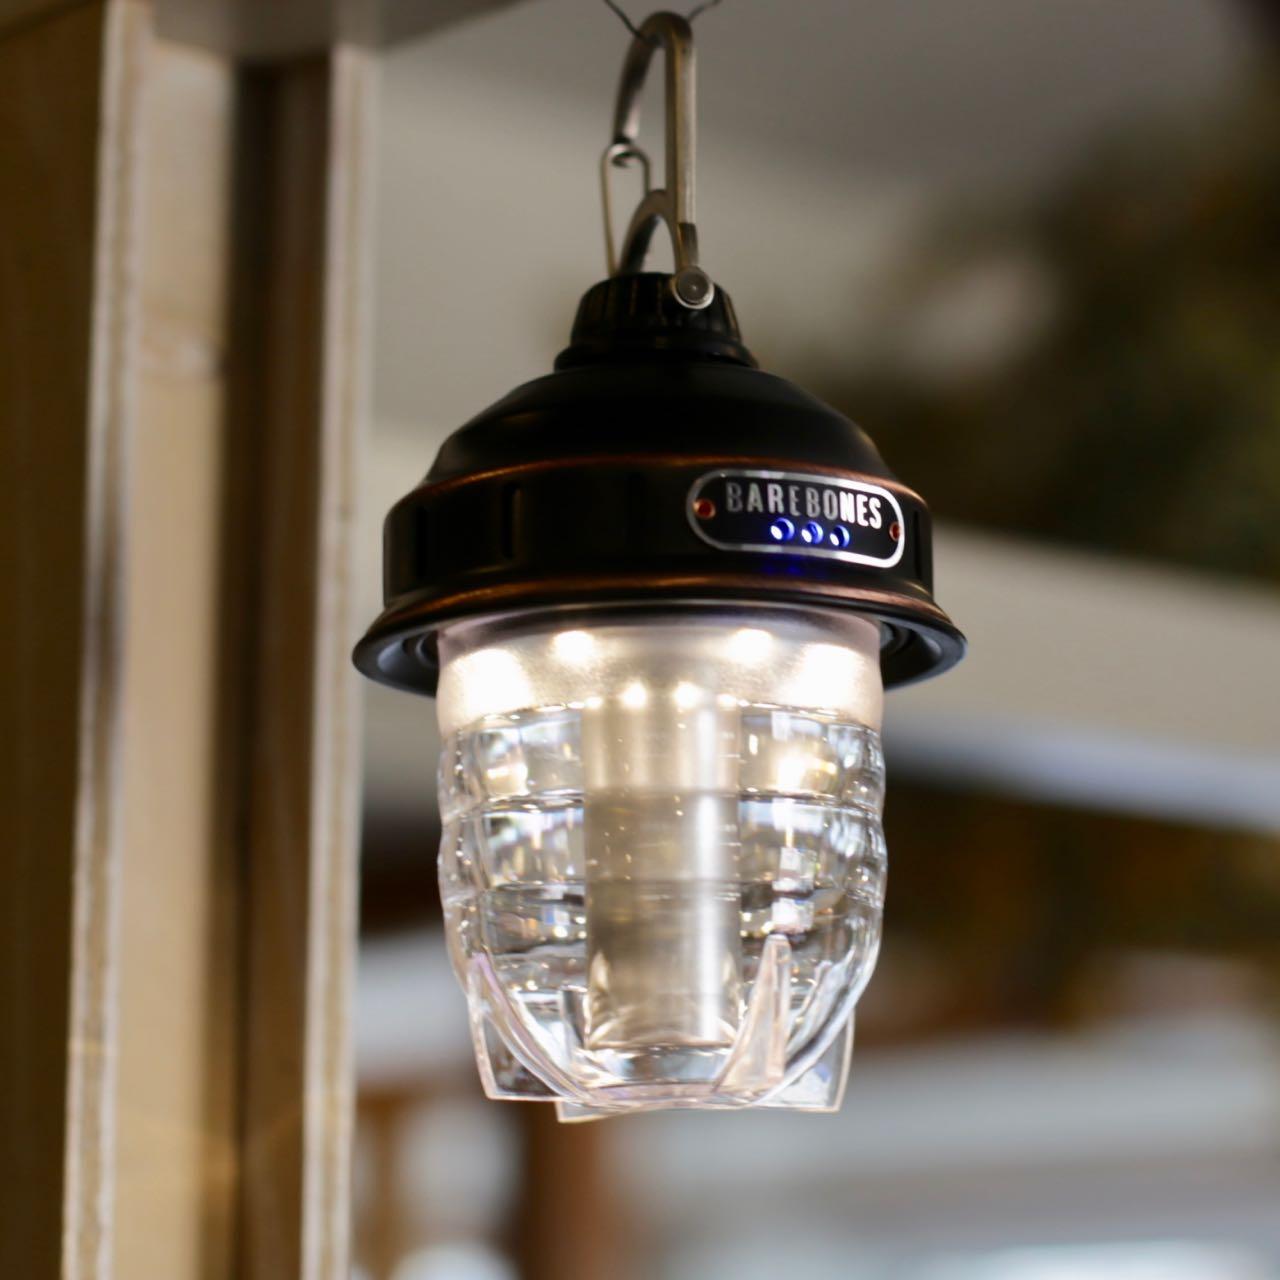 Barebones Living Beacon ベアボーンズ リビング ビーコン ライト LED